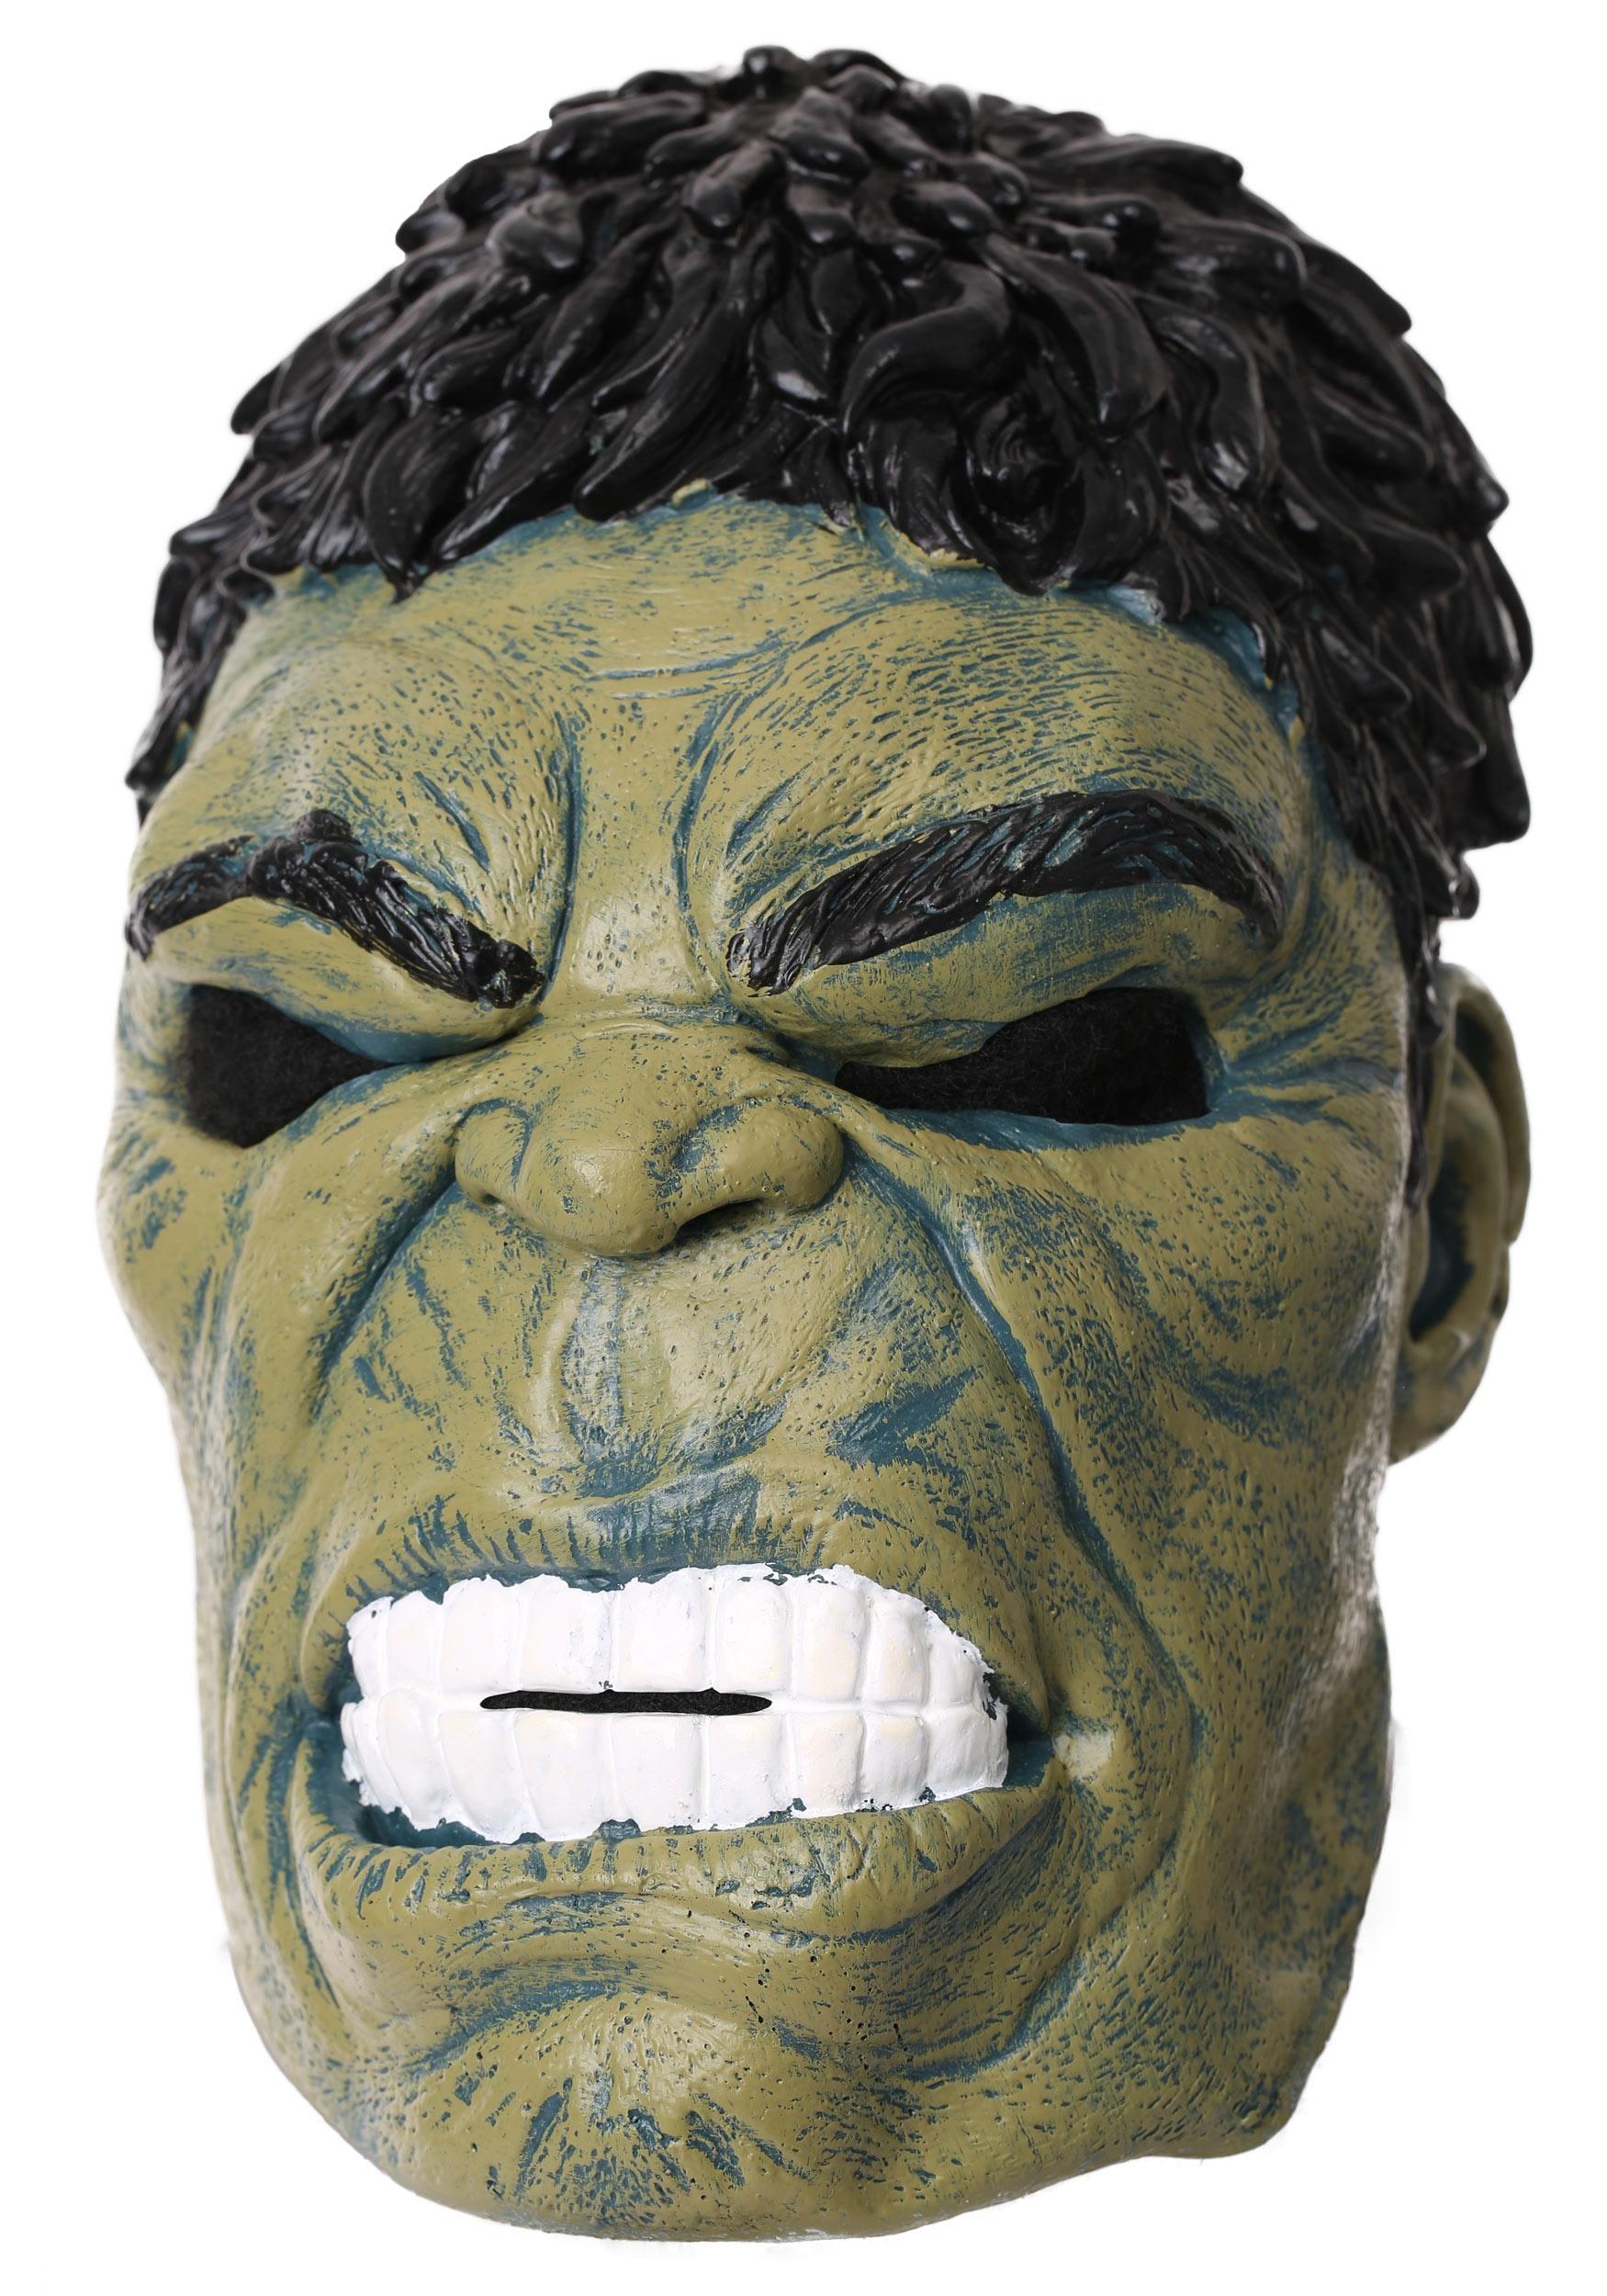 340b1f56aa7 Marvel Avengers Infinity War Hulk Mask for Adults